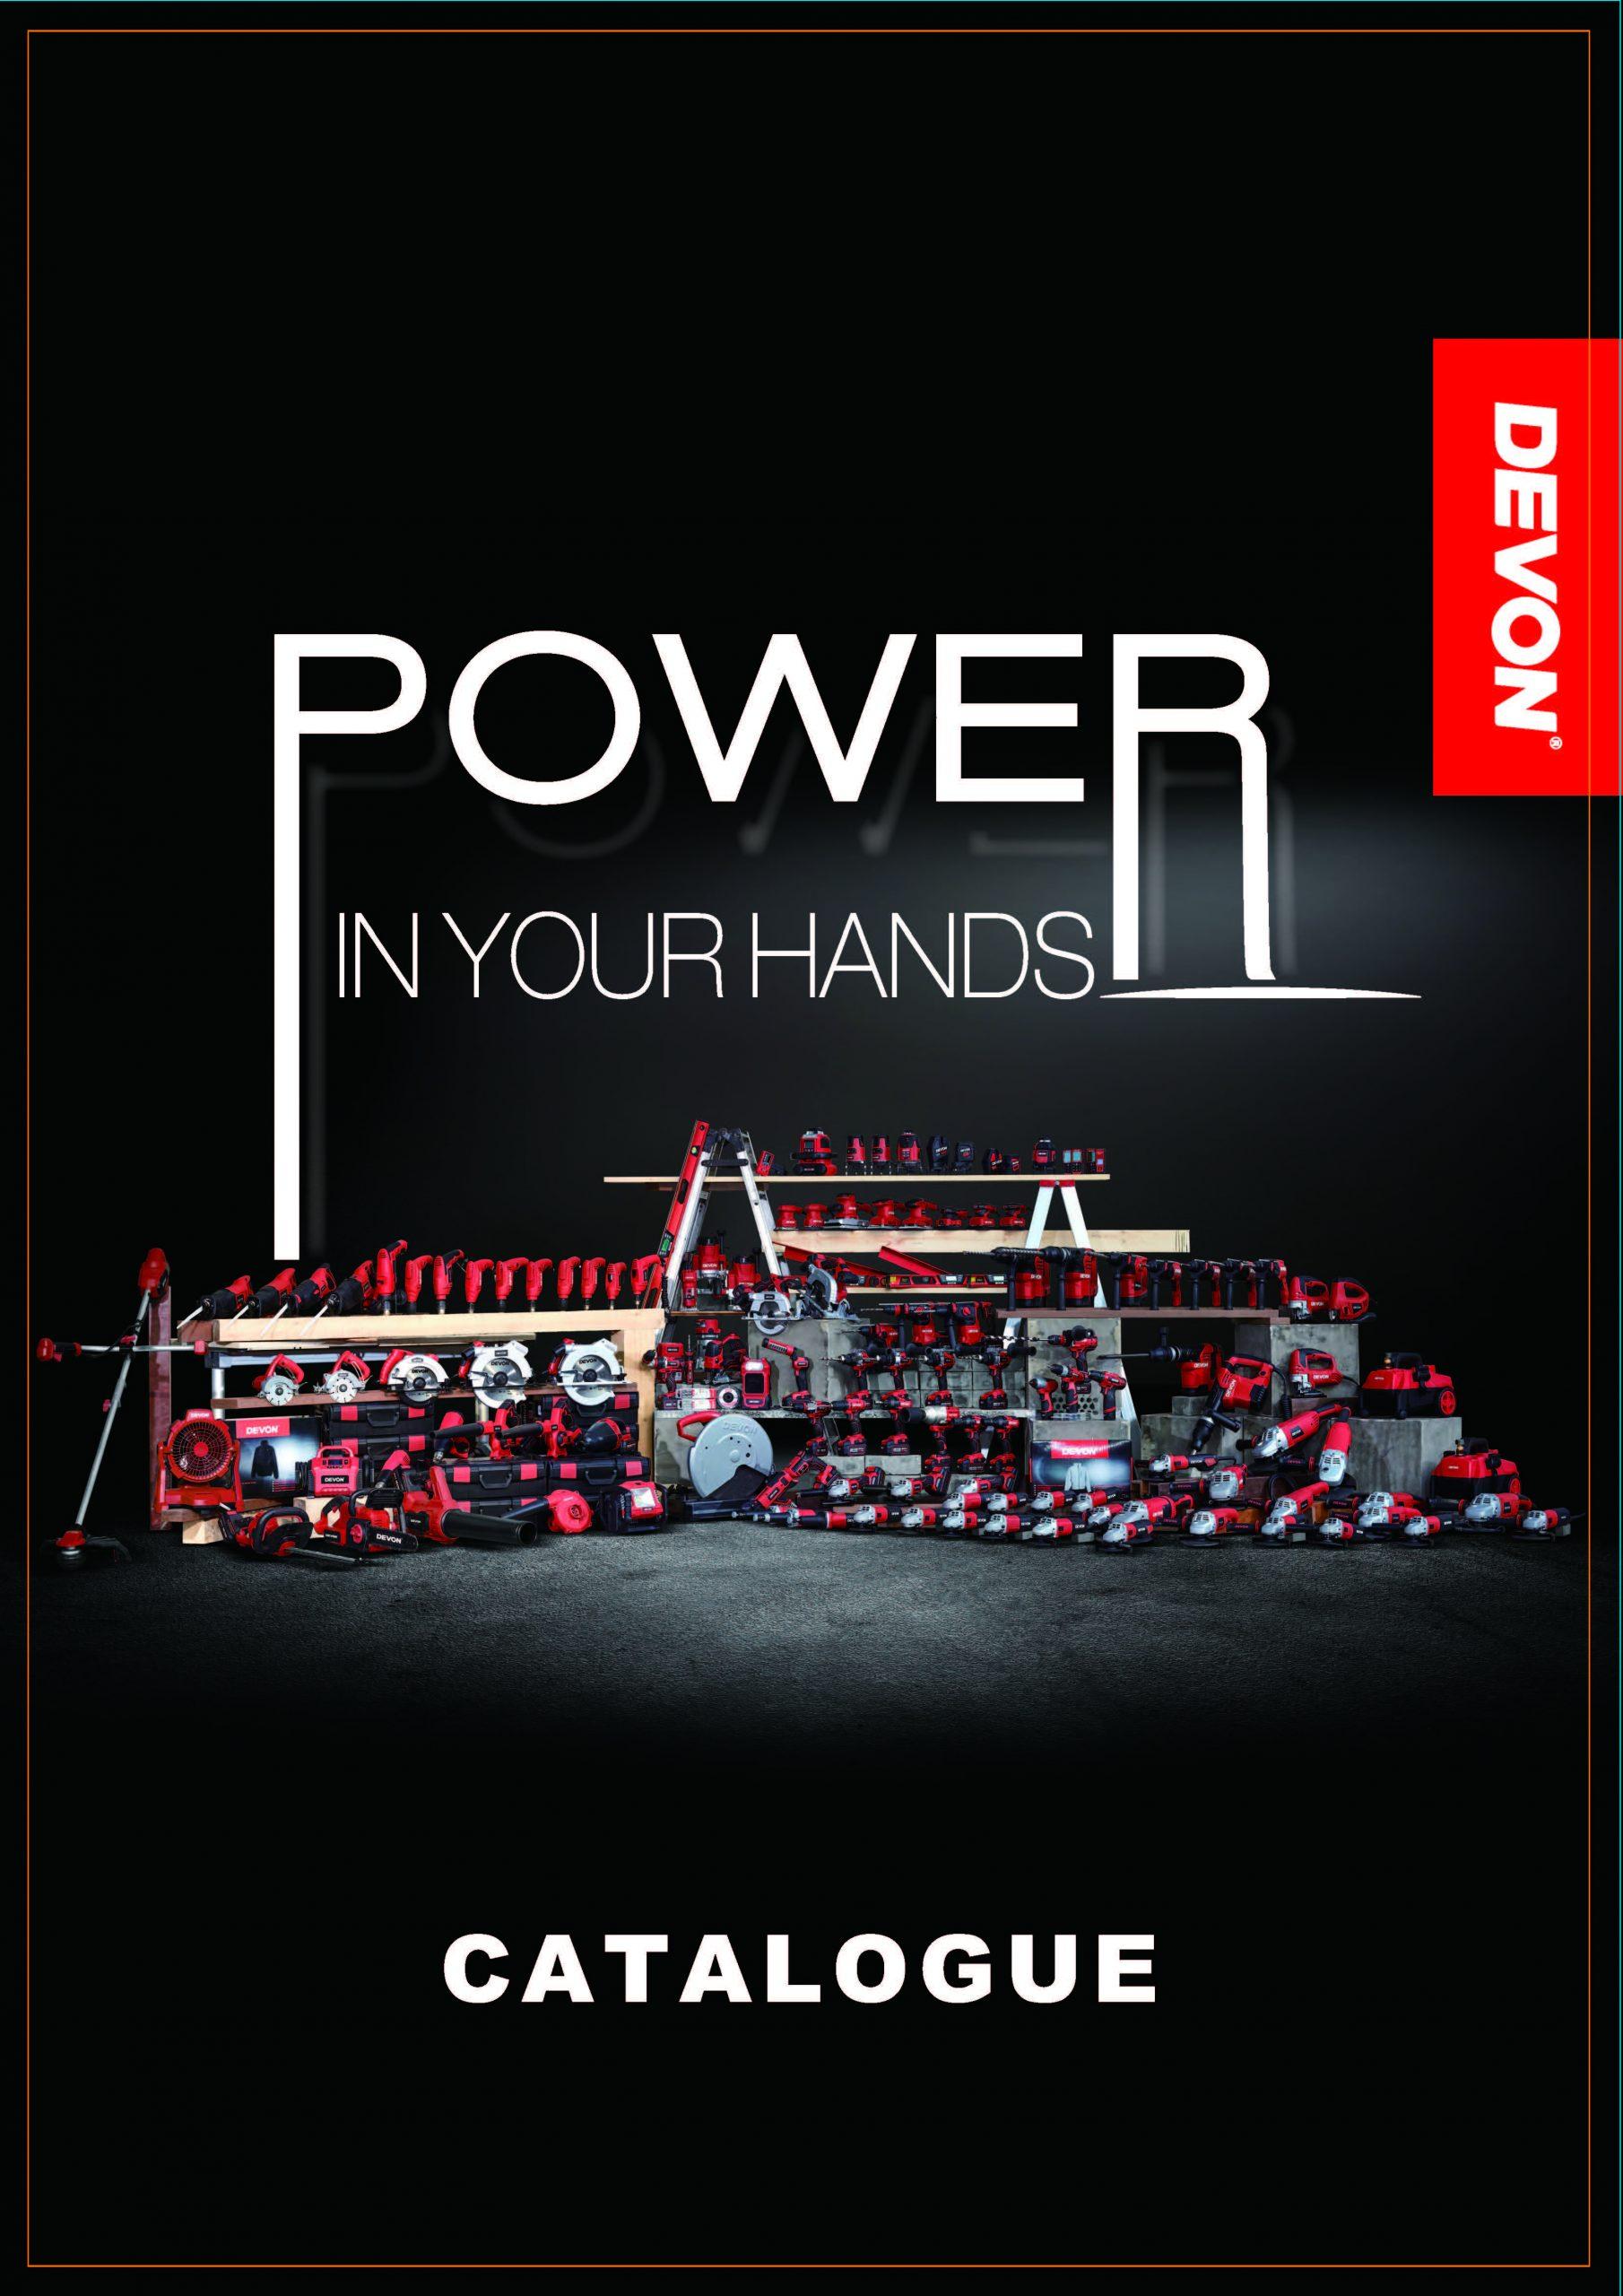 Devon power tools Catalog